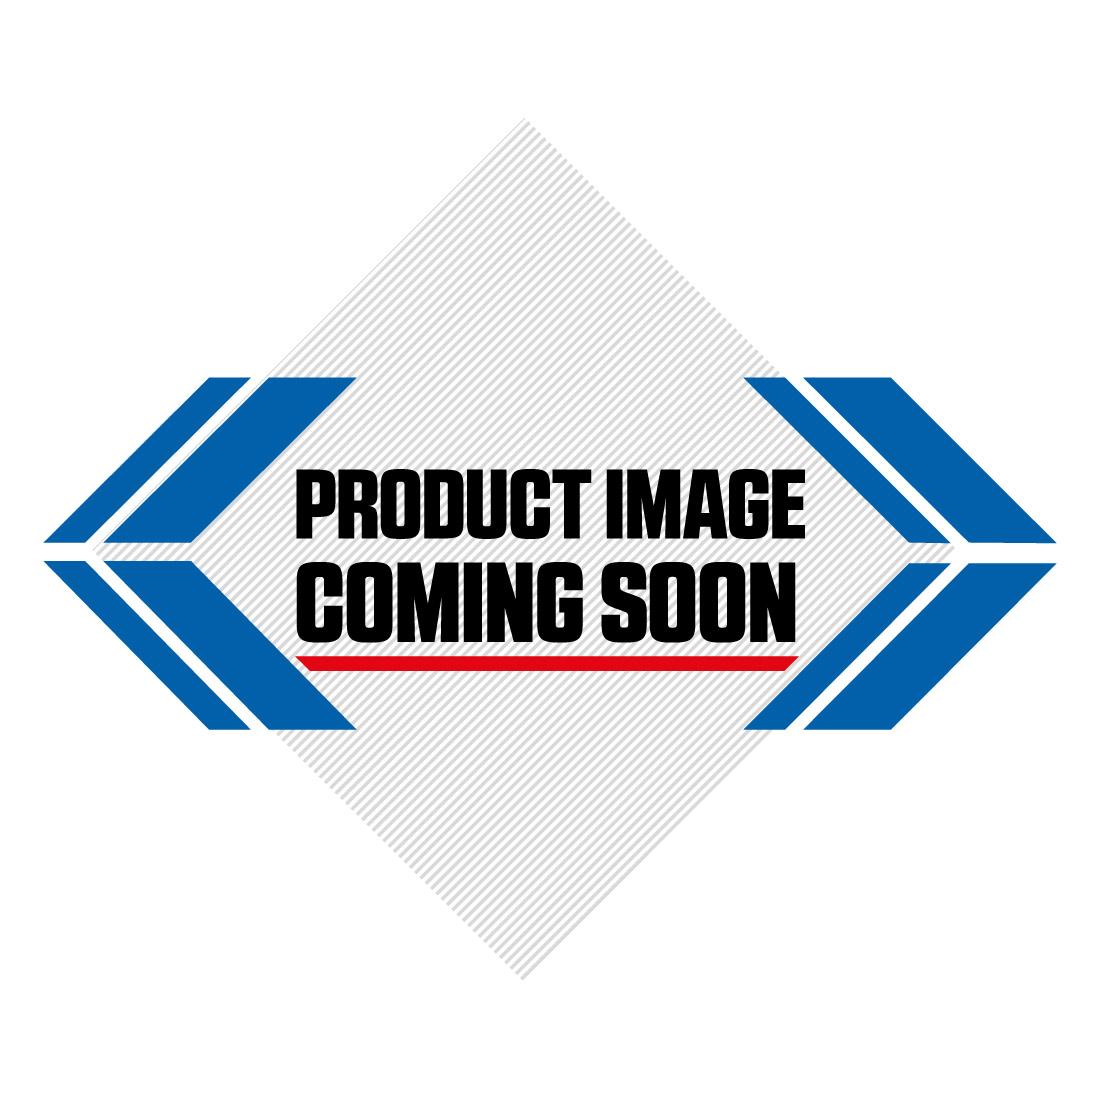 UFO Honda EVO Plastic Kit CR 500 (91-94) OEM Factory Image-4>